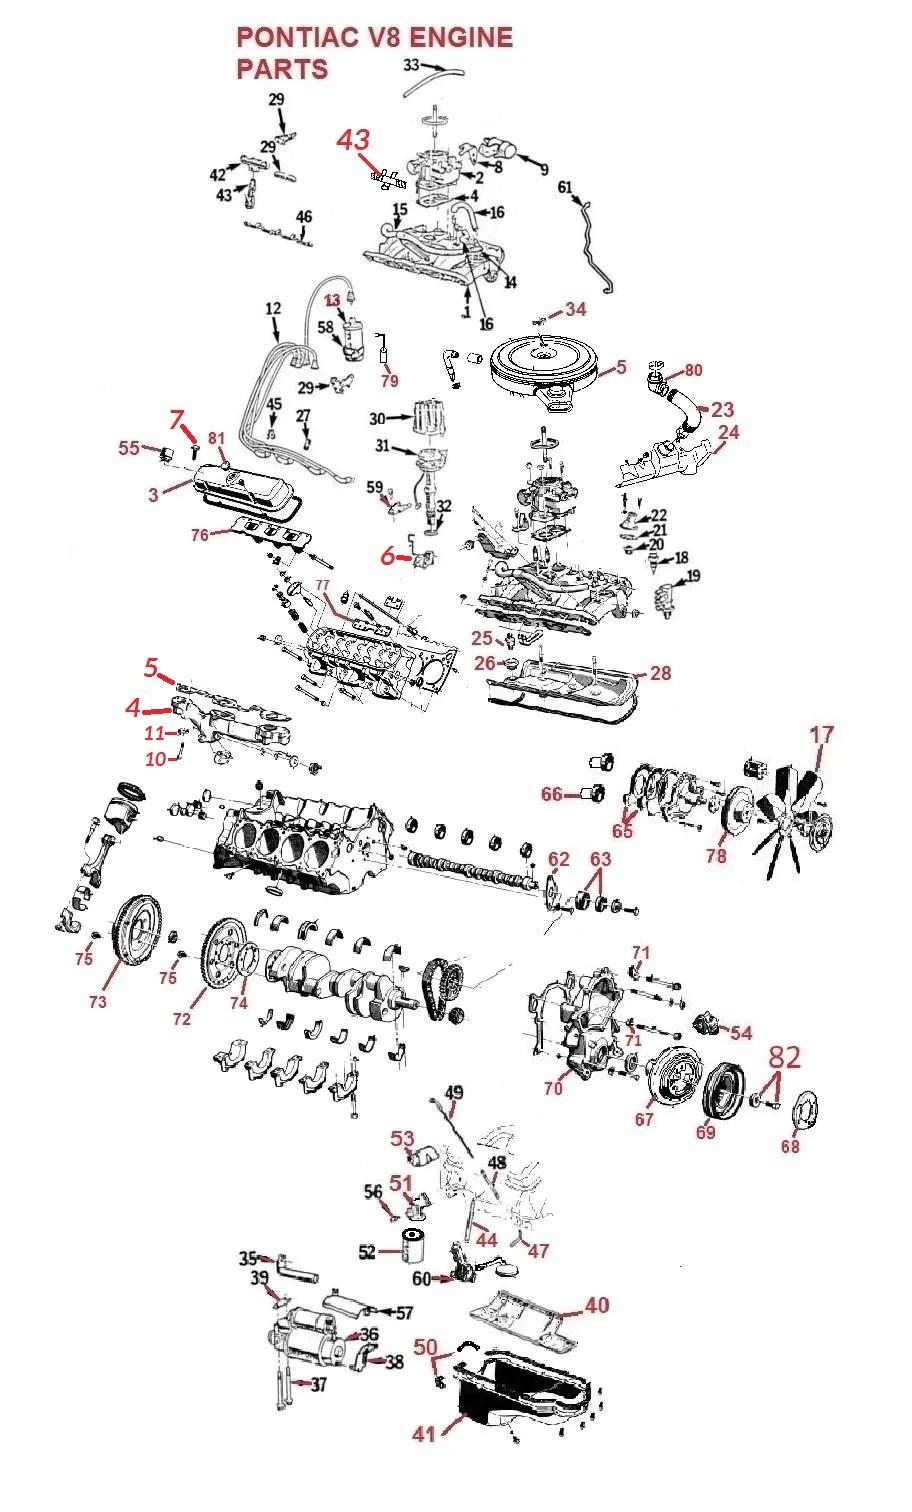 medium resolution of 67 72 pontiac v8 engine parts